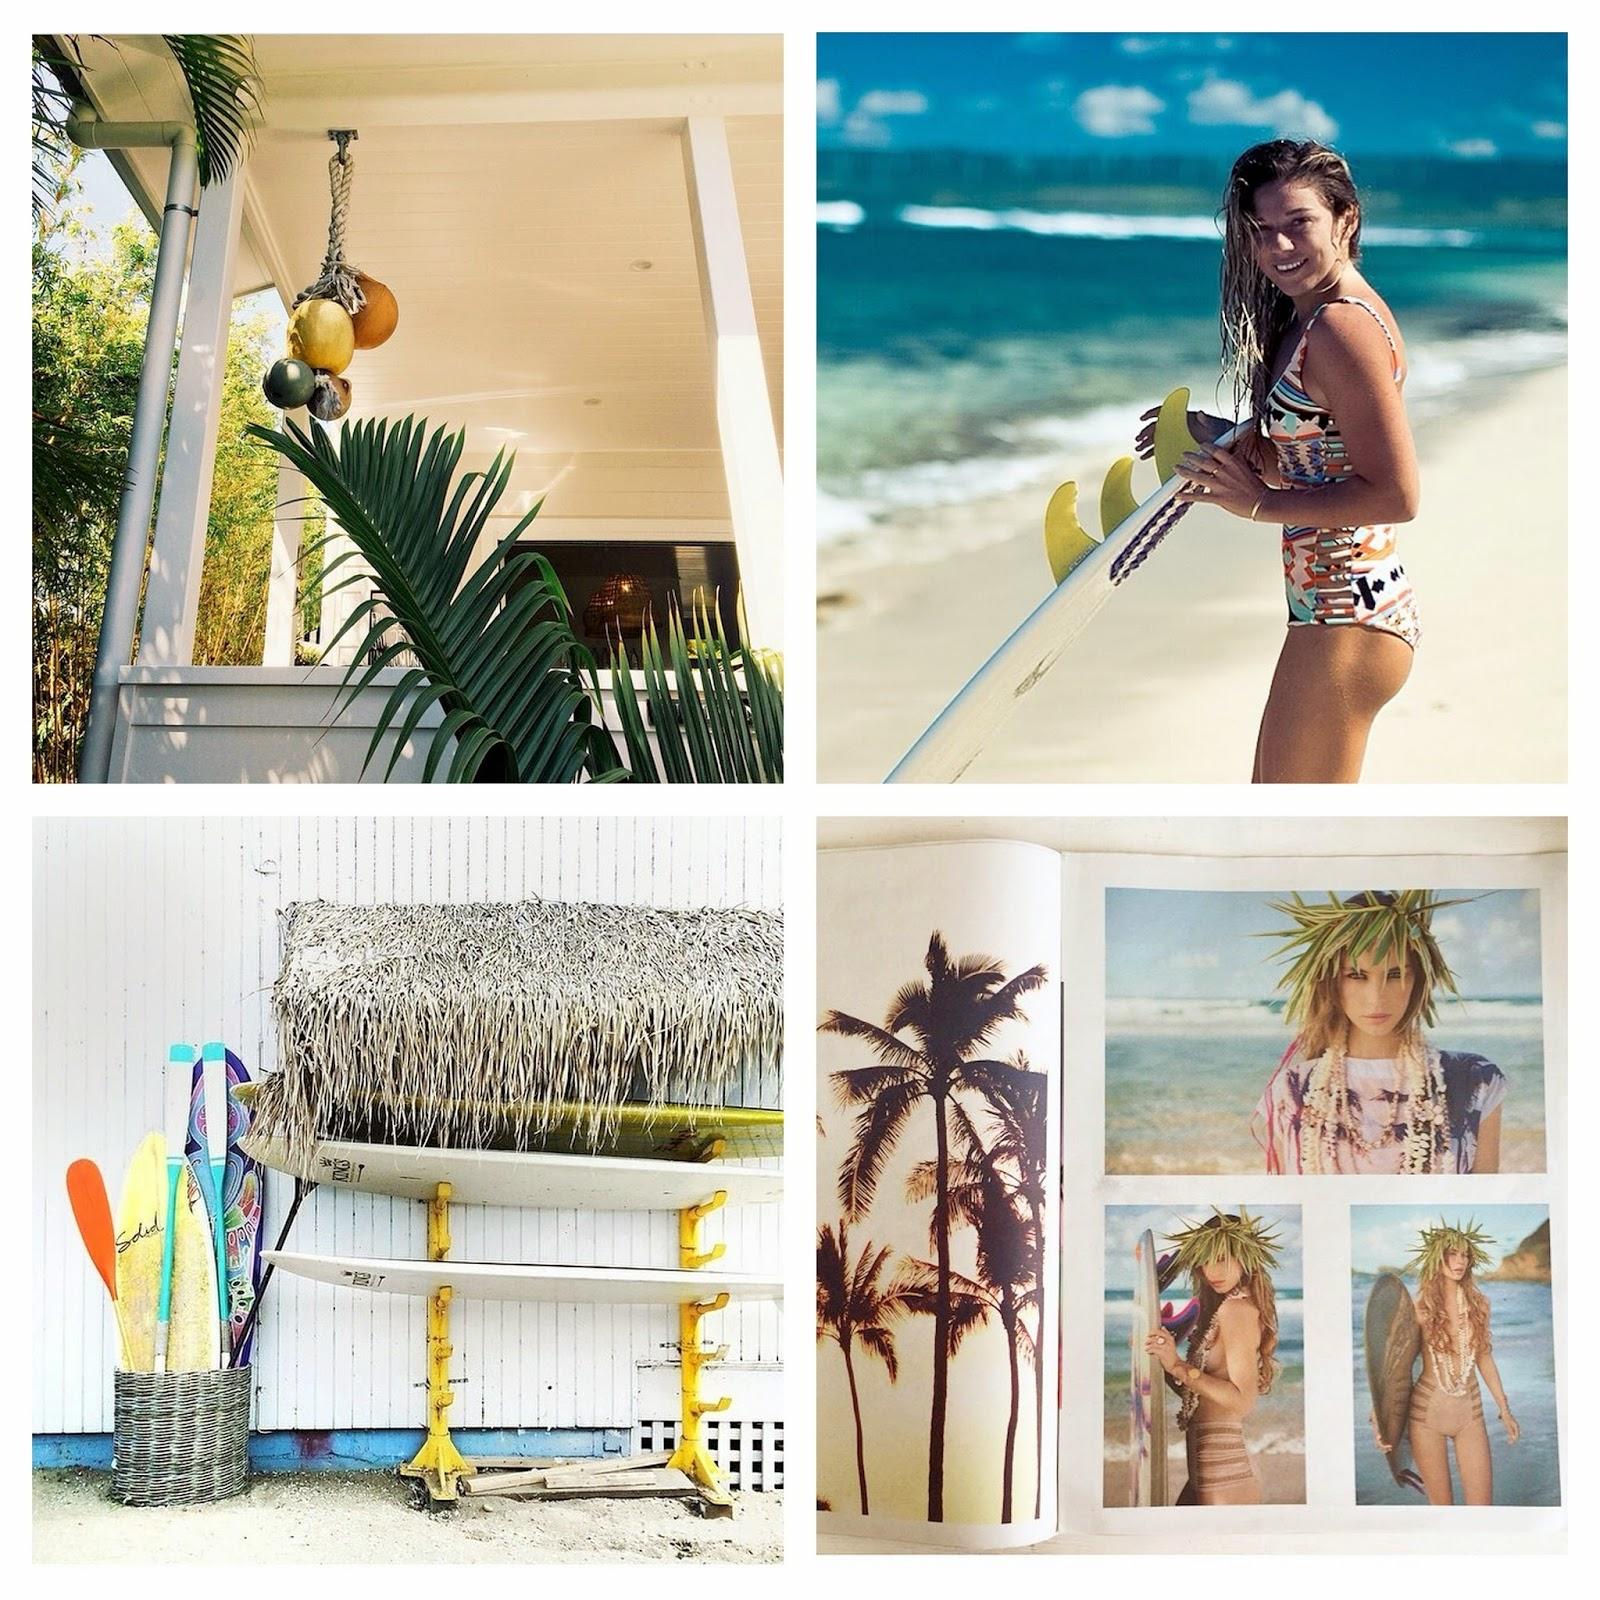 instalove,the mood,moodboard,instagram;surfer girl